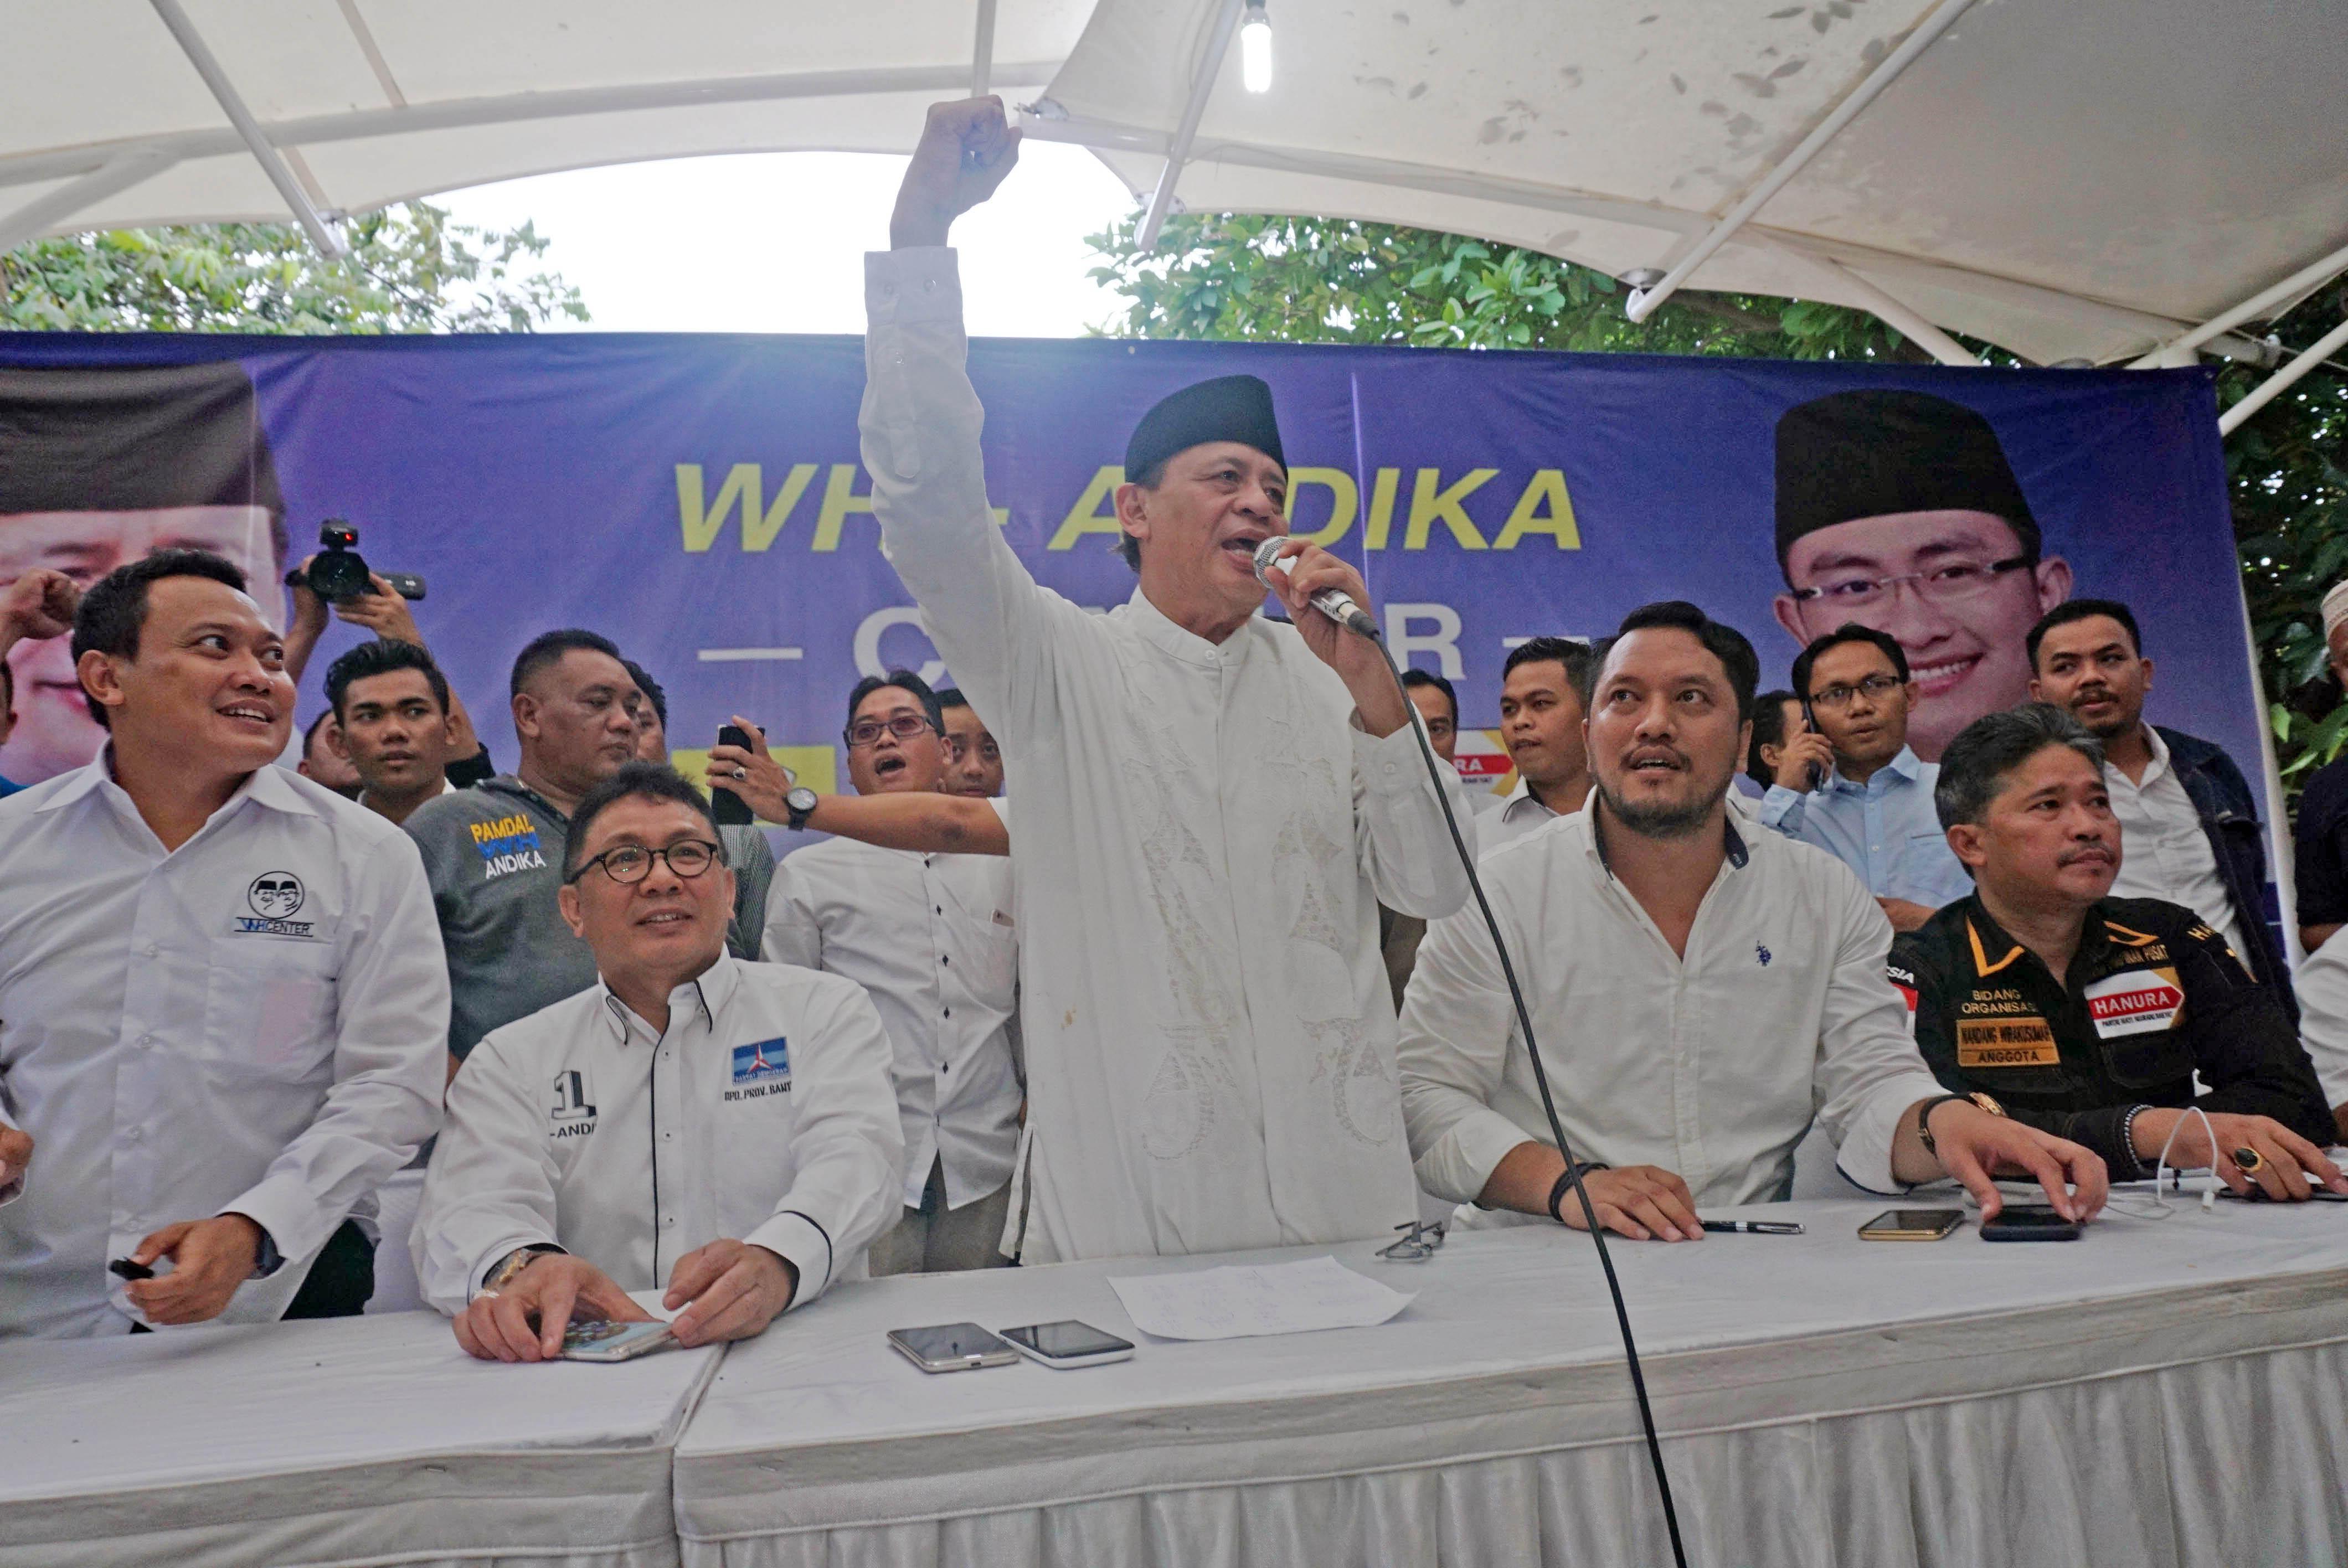 Cagub Banten Wahidin Halim (ketiga kiri) memberikan pernyataan kemenangannya berdasarkan sejumlah hasil survei dengan kemenangan di atas 51 persen. Foto oleh Lucky R./Antara